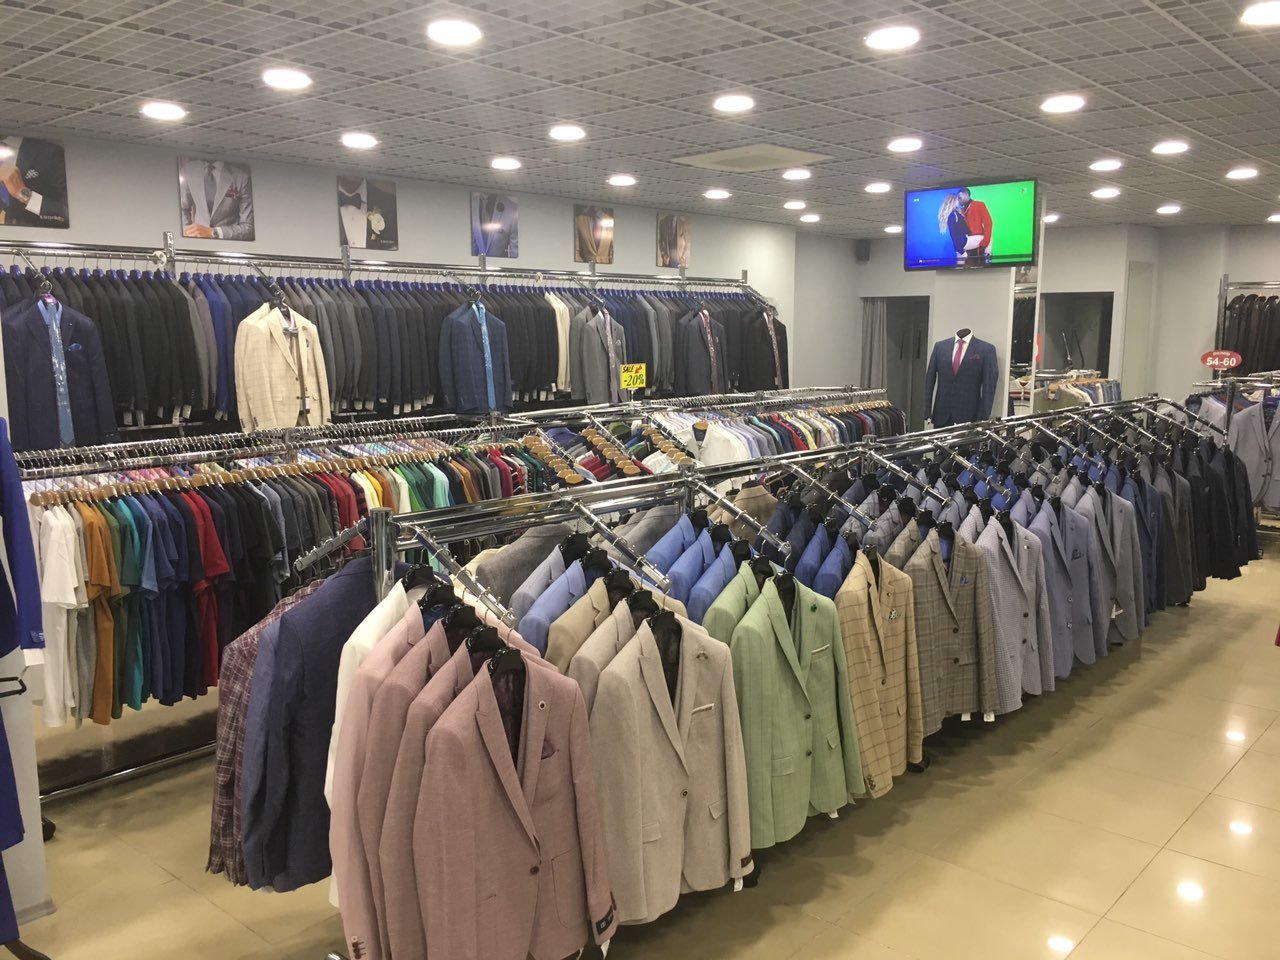 b0c8b47e42dc Egoist, NCS, магазины мужской одежды в Кременчуге на 05366.com.ua